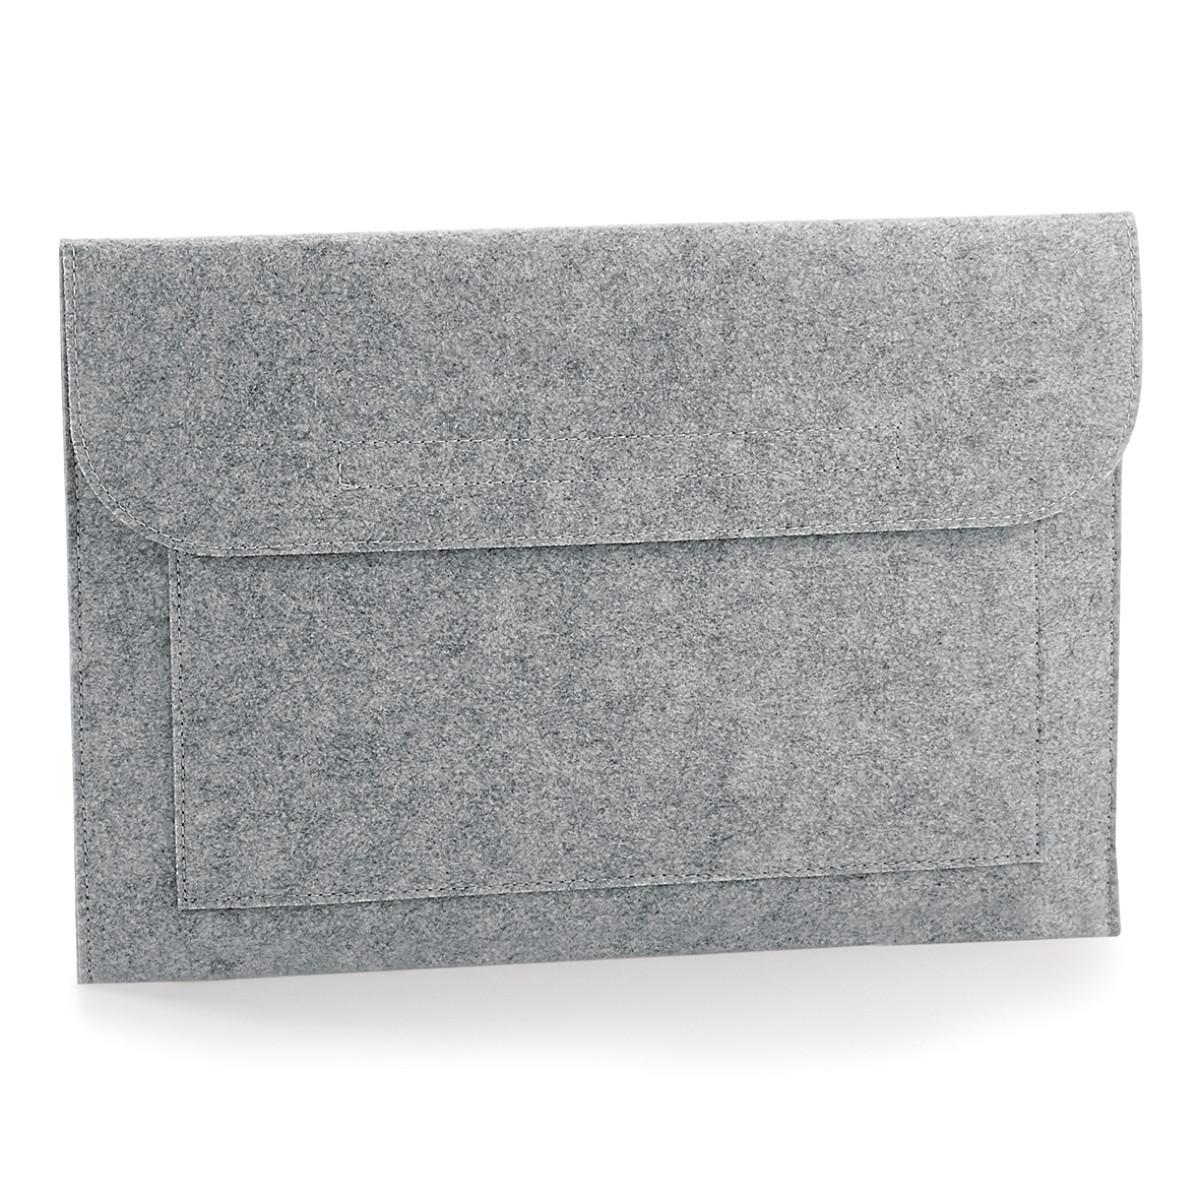 Bagbase Felt Laptop/ Document Slip